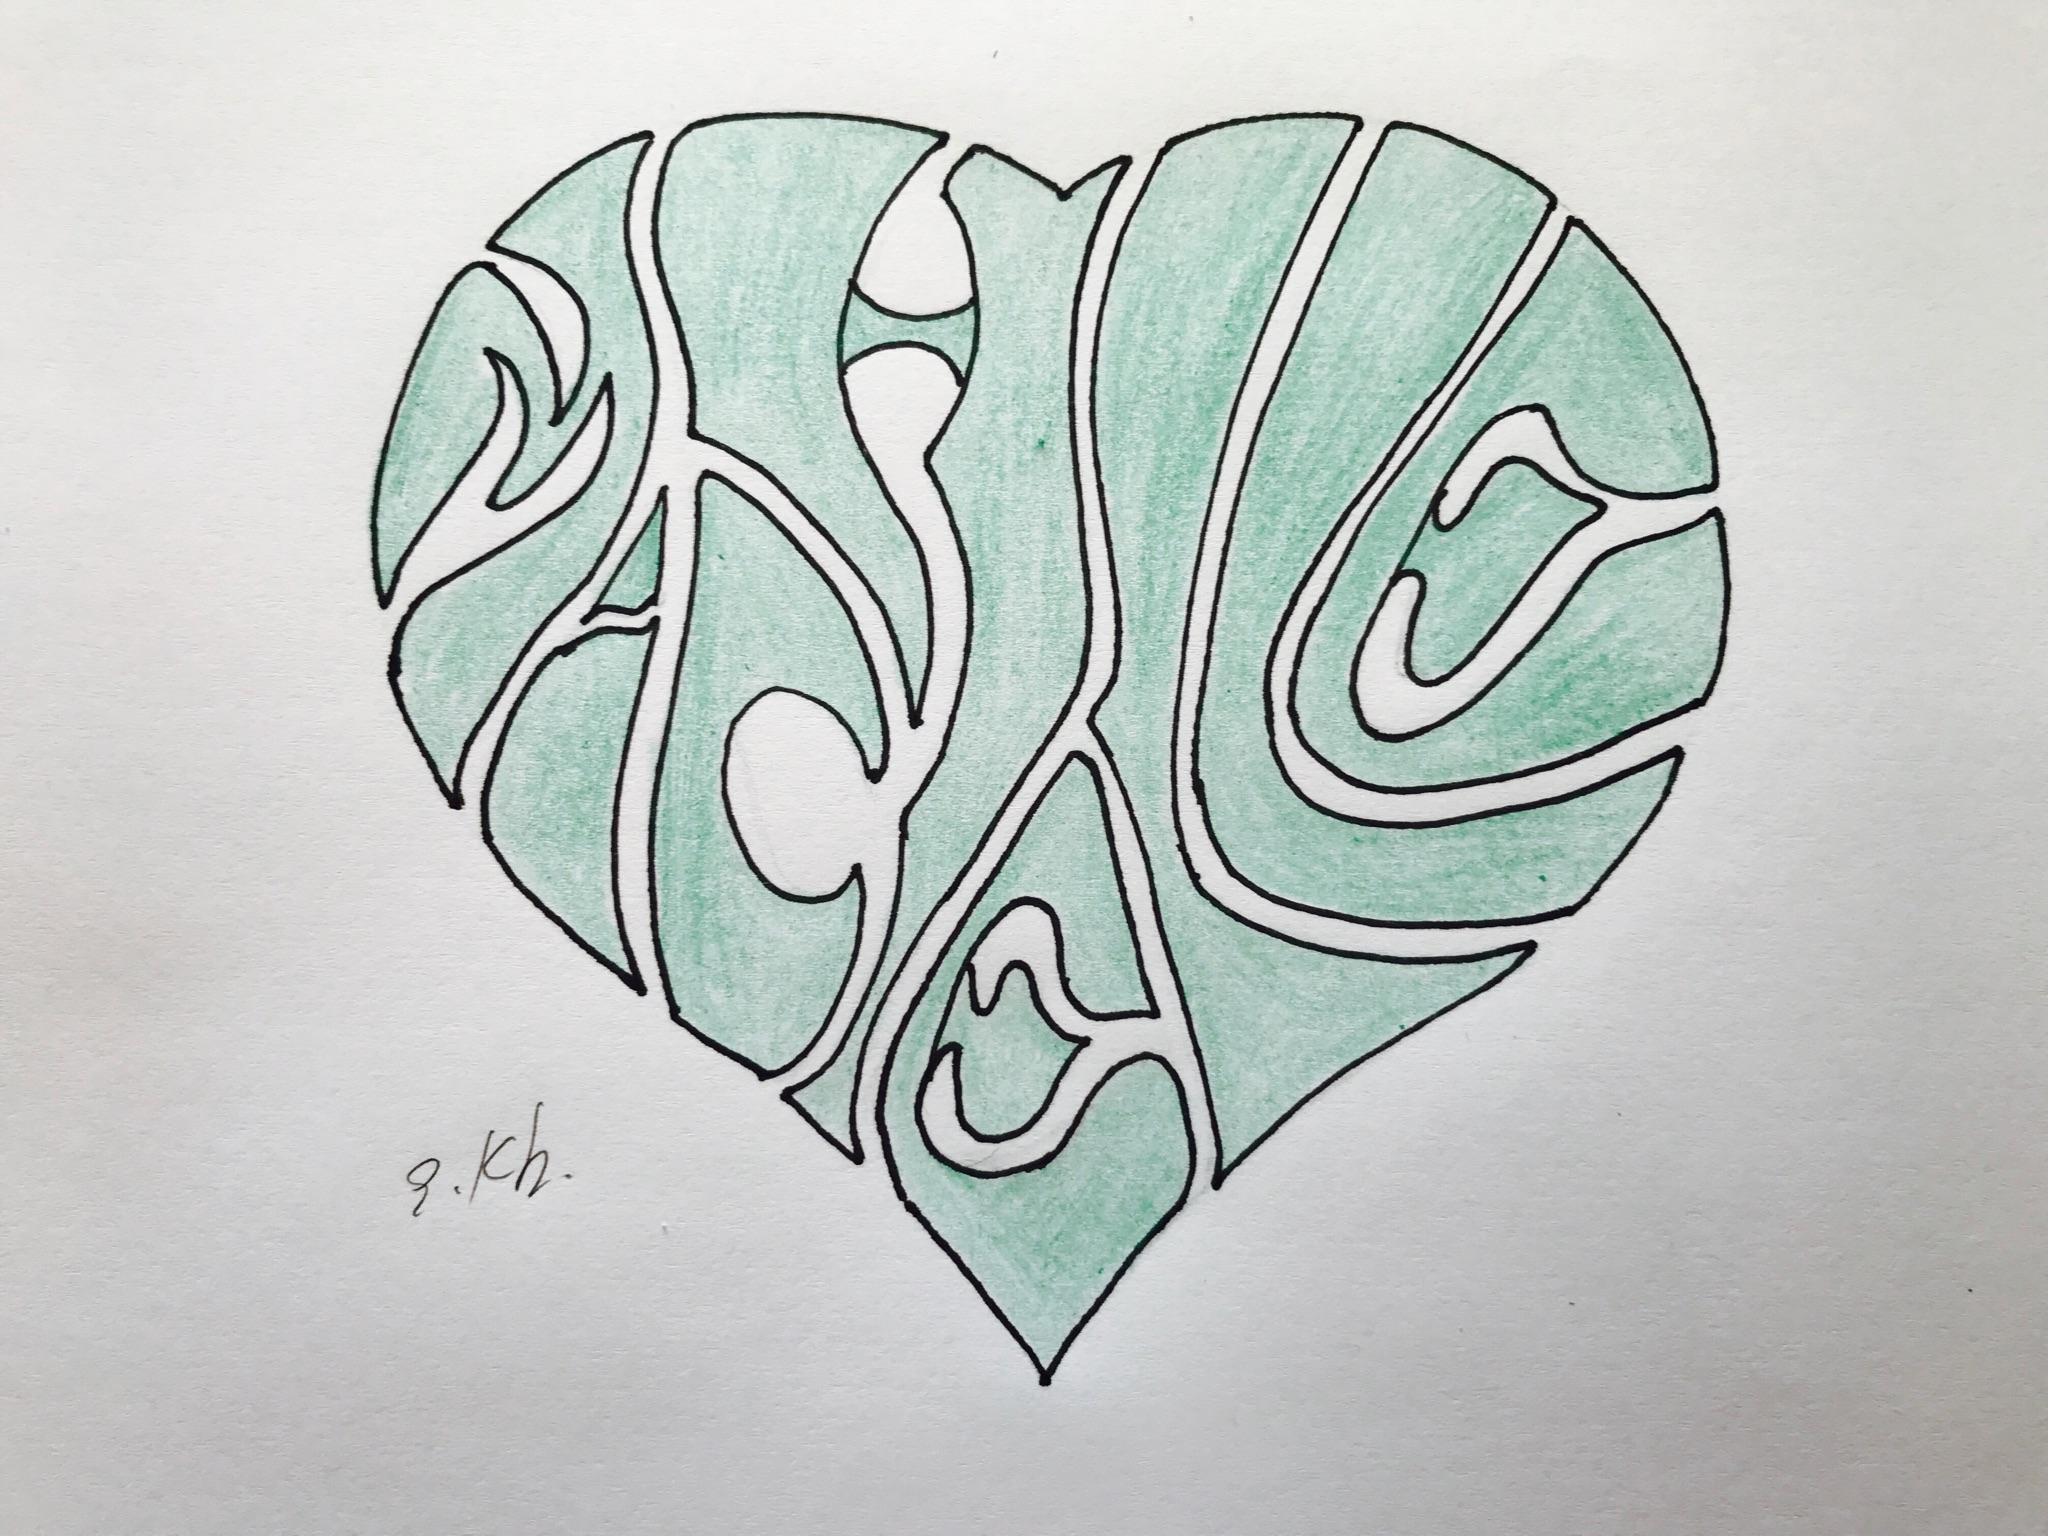 Michelle Heart